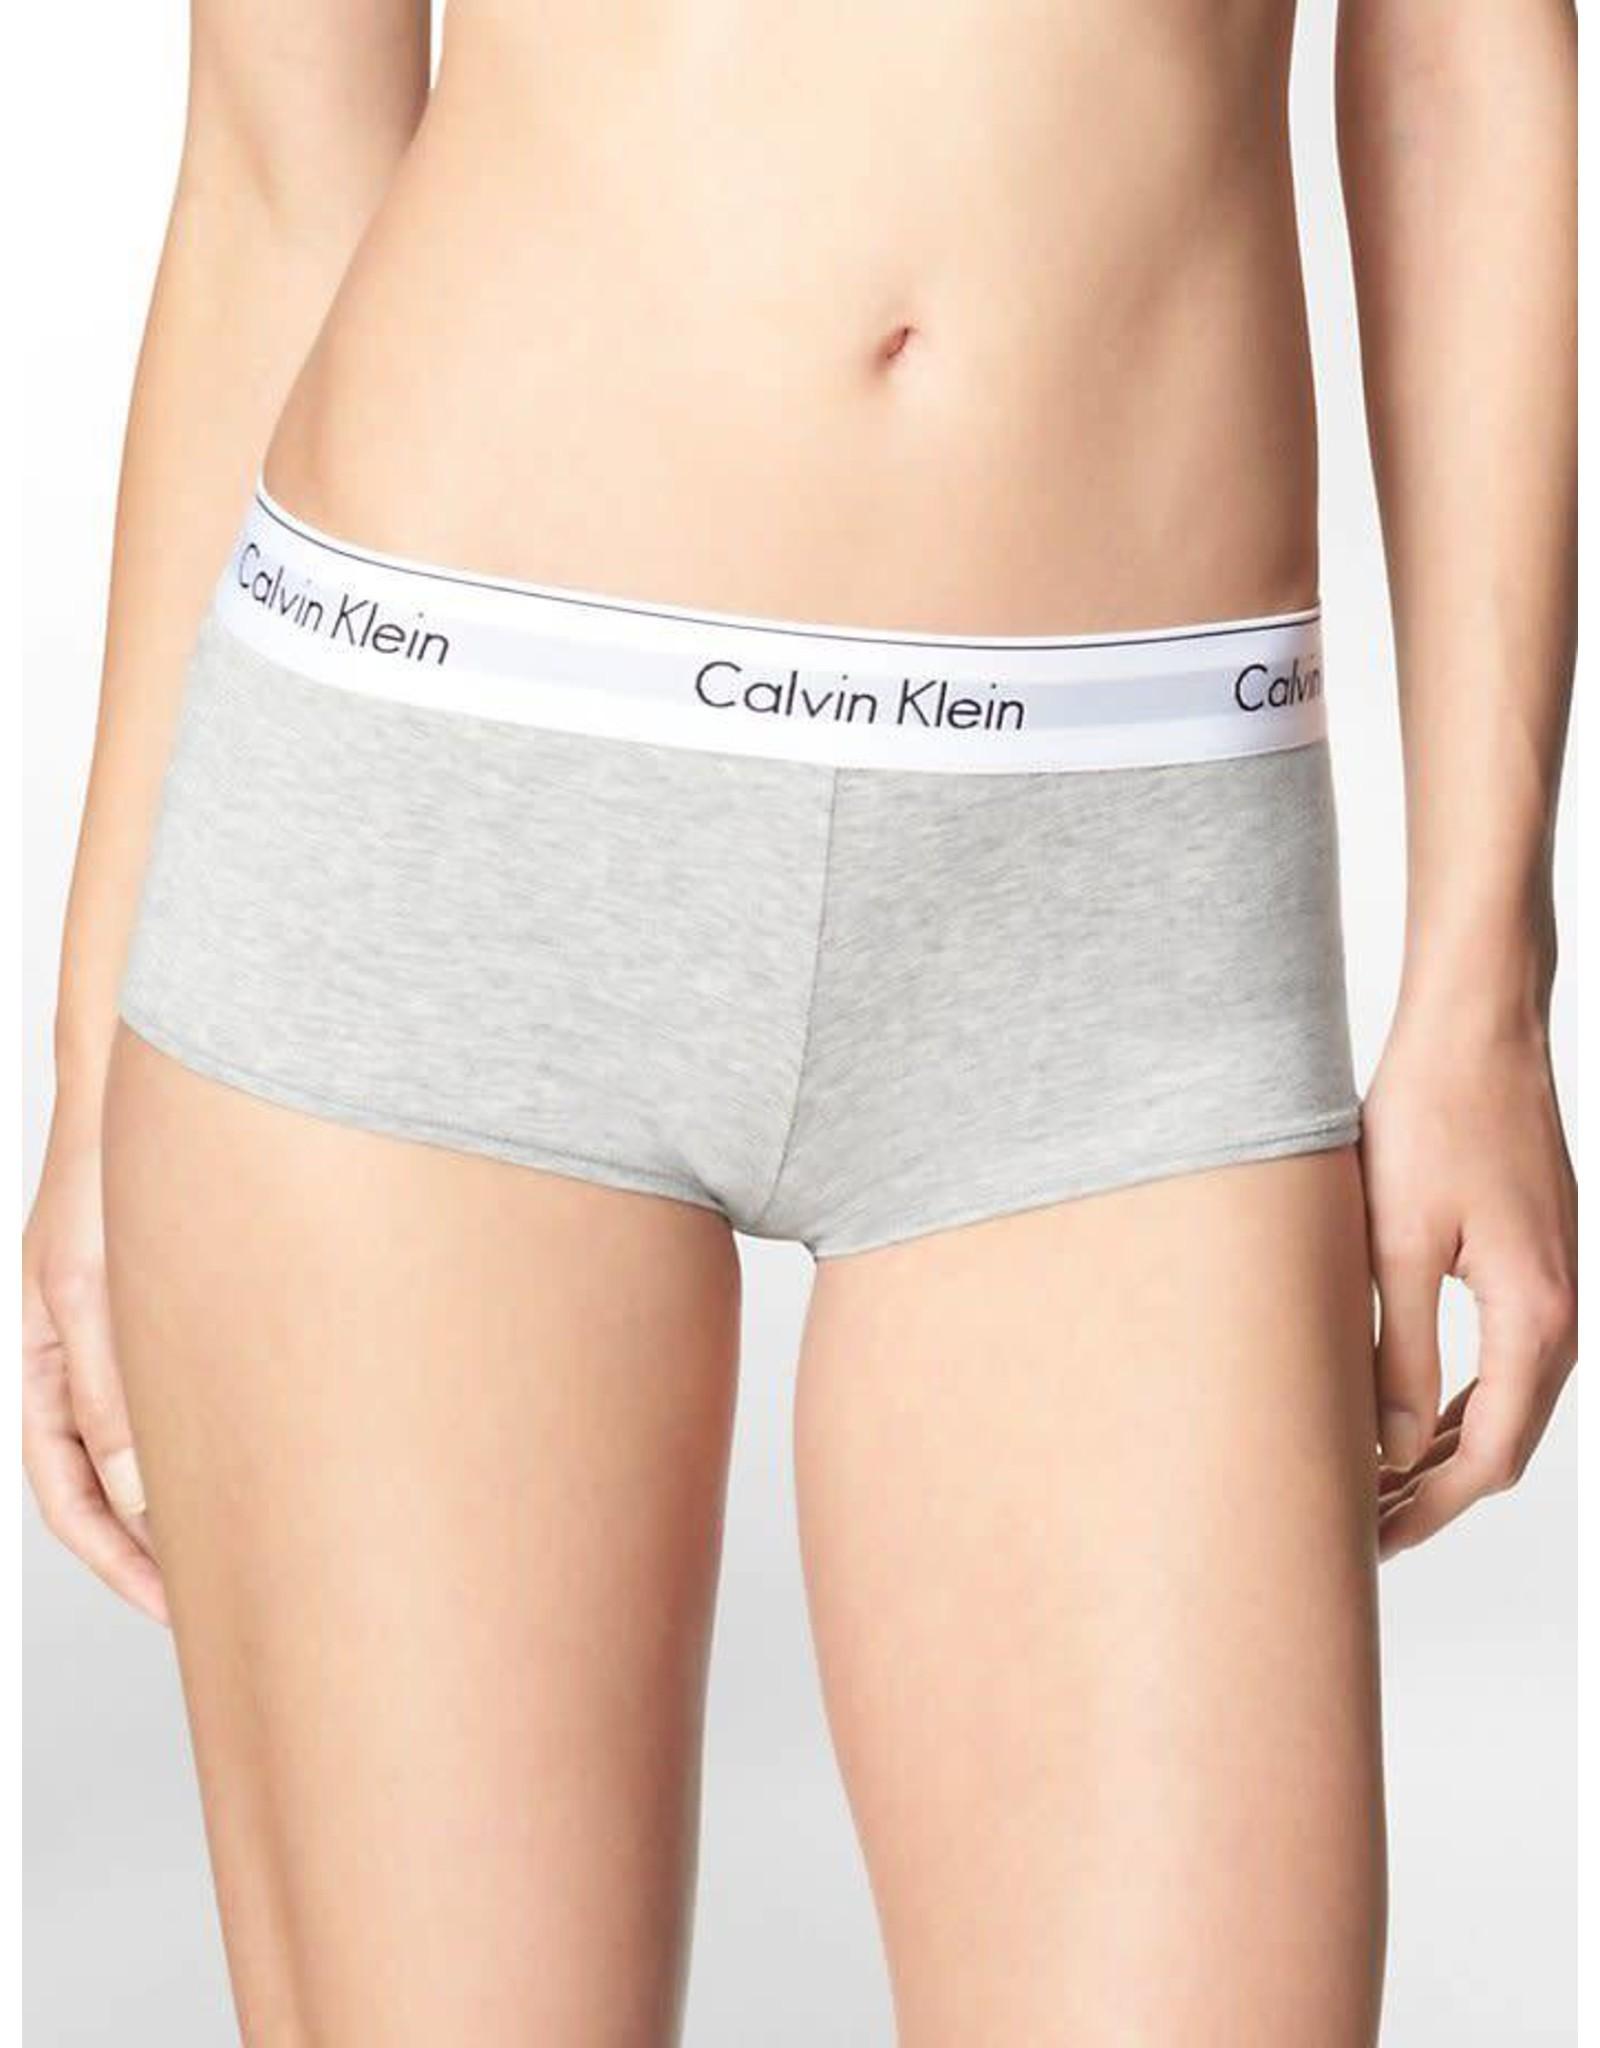 Calvin Klein Calvin Klein Modern Cotton Boyshort